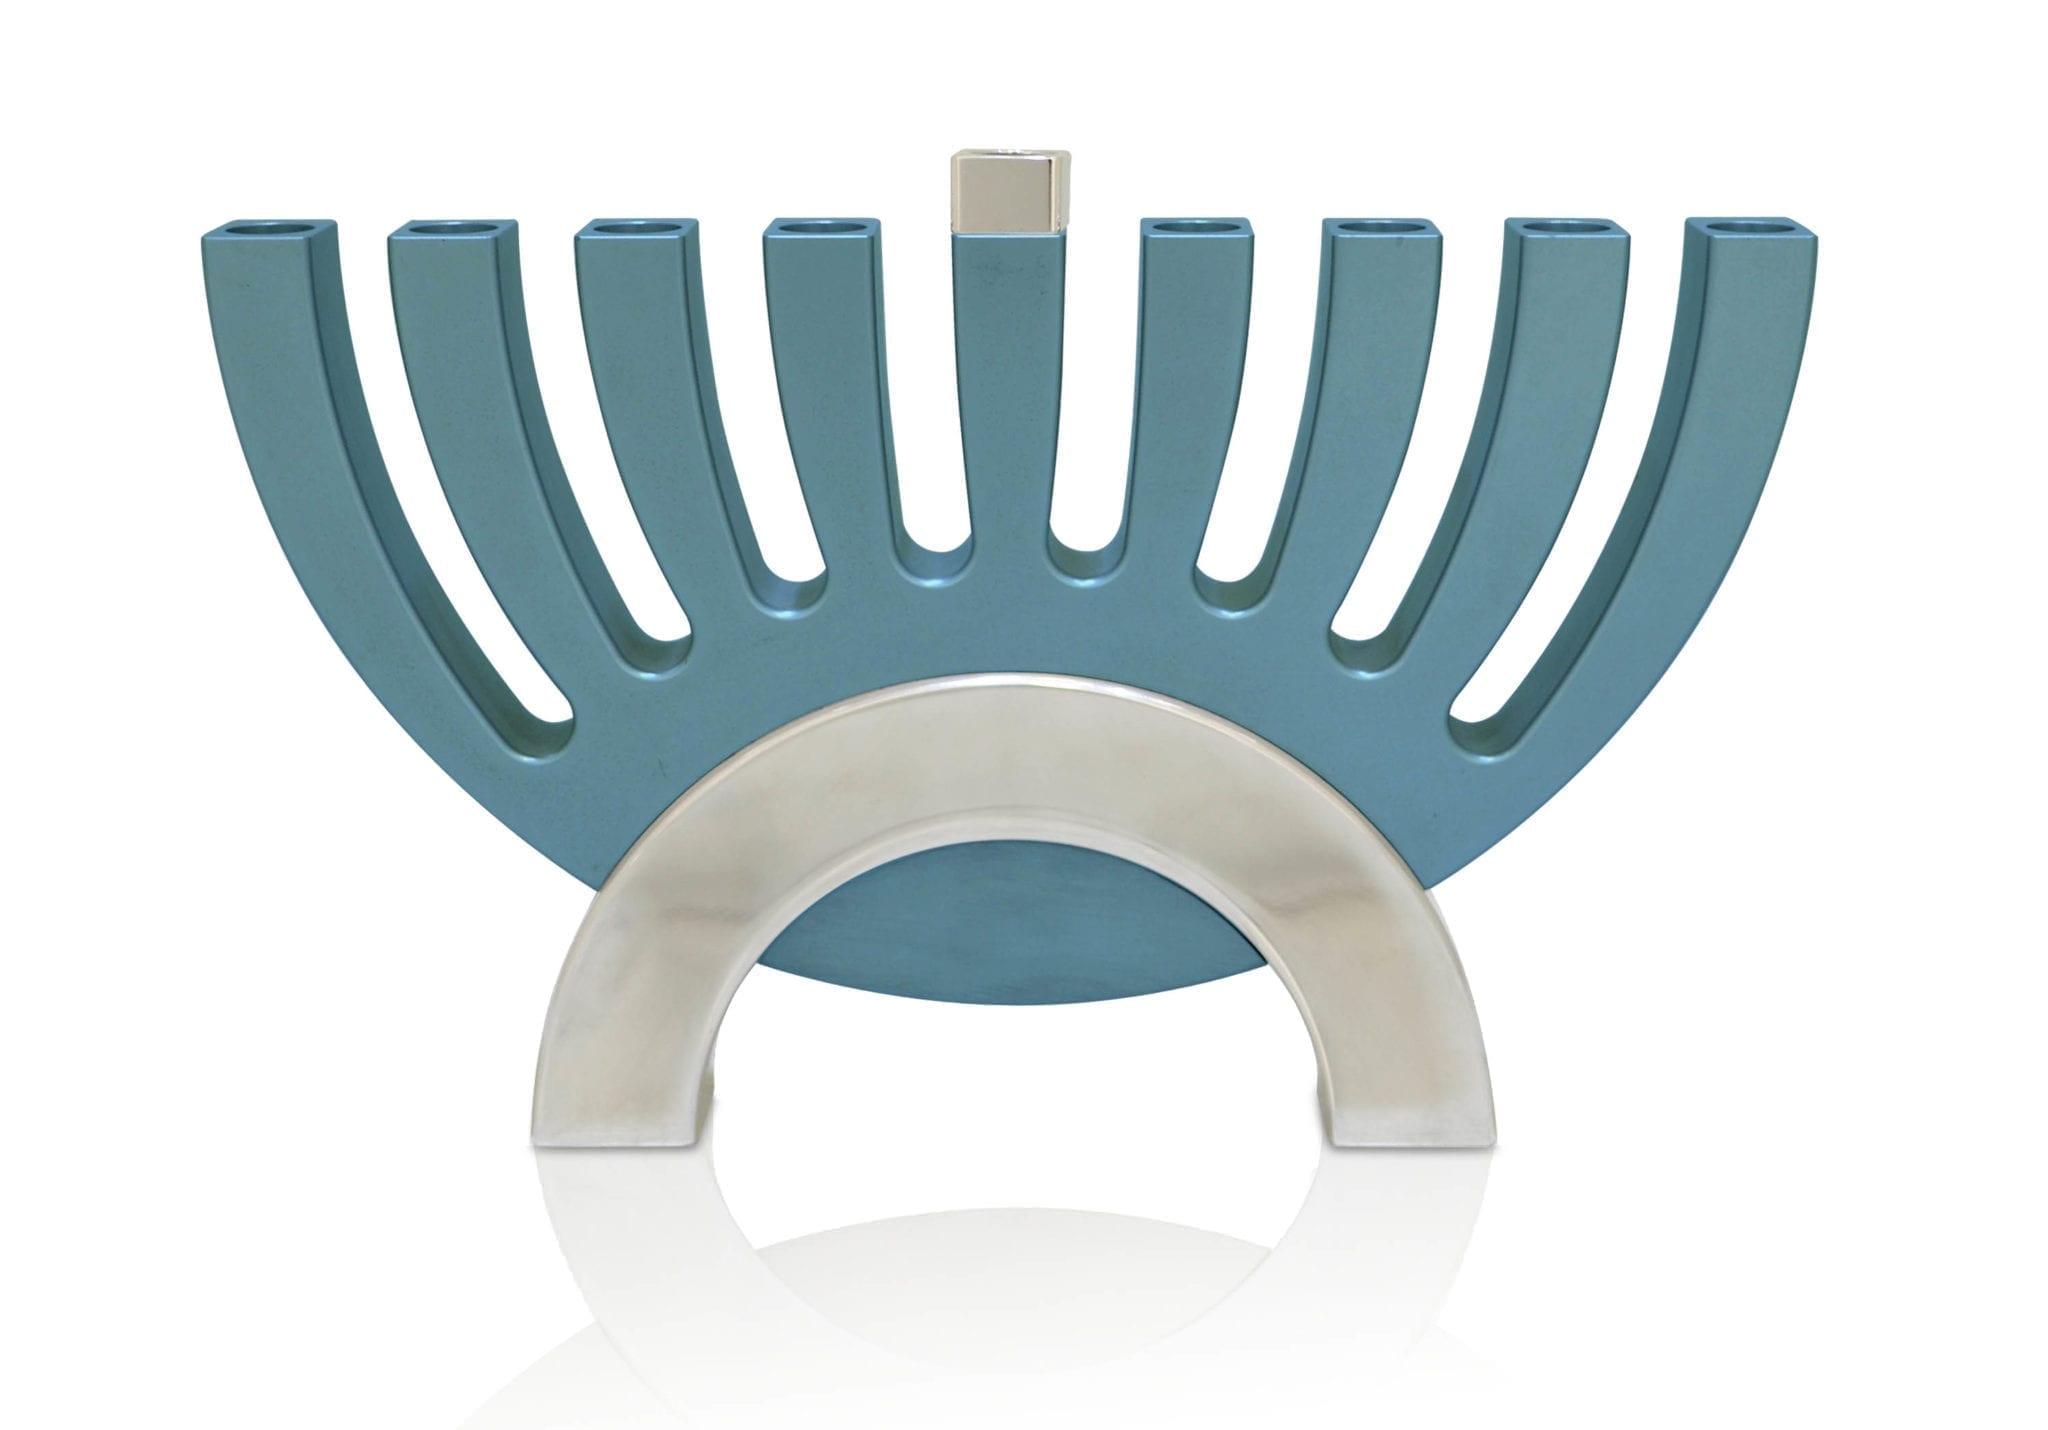 shiny flipping menorah & candle holder, Hanukkah judaica made in Israel